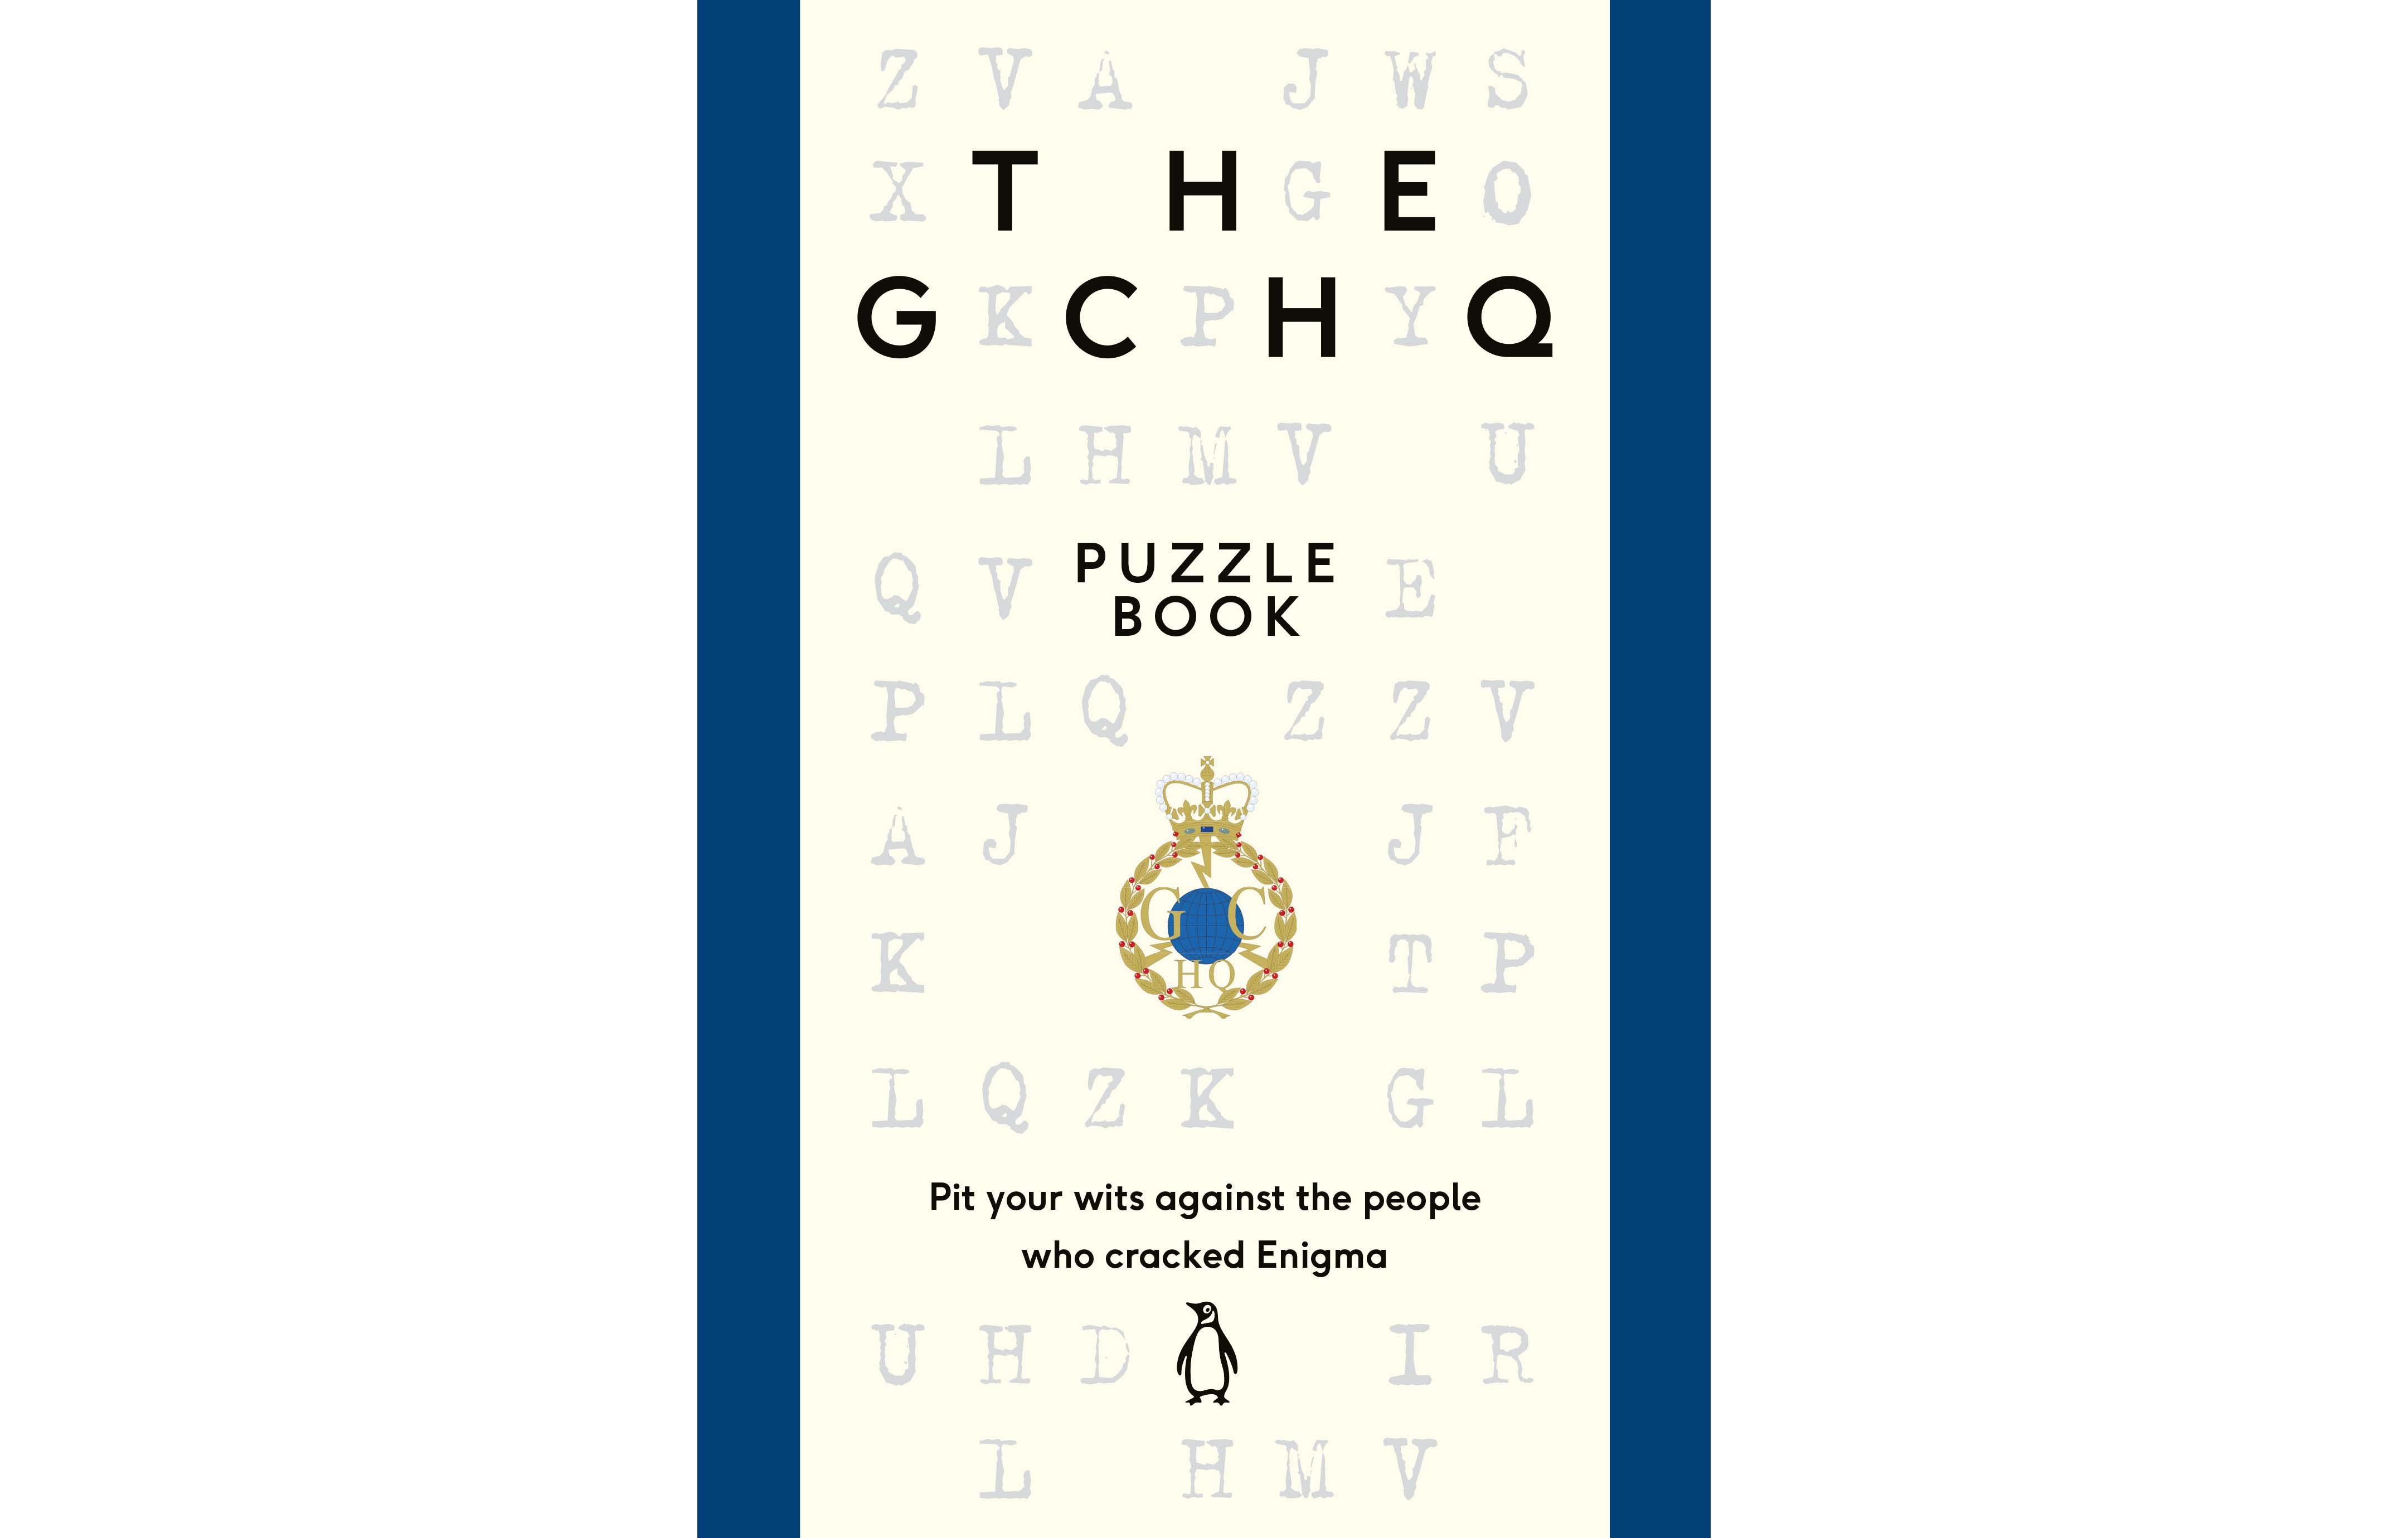 The GCHQ Puzzle Book Duchess of Cambridge Kate Middleton